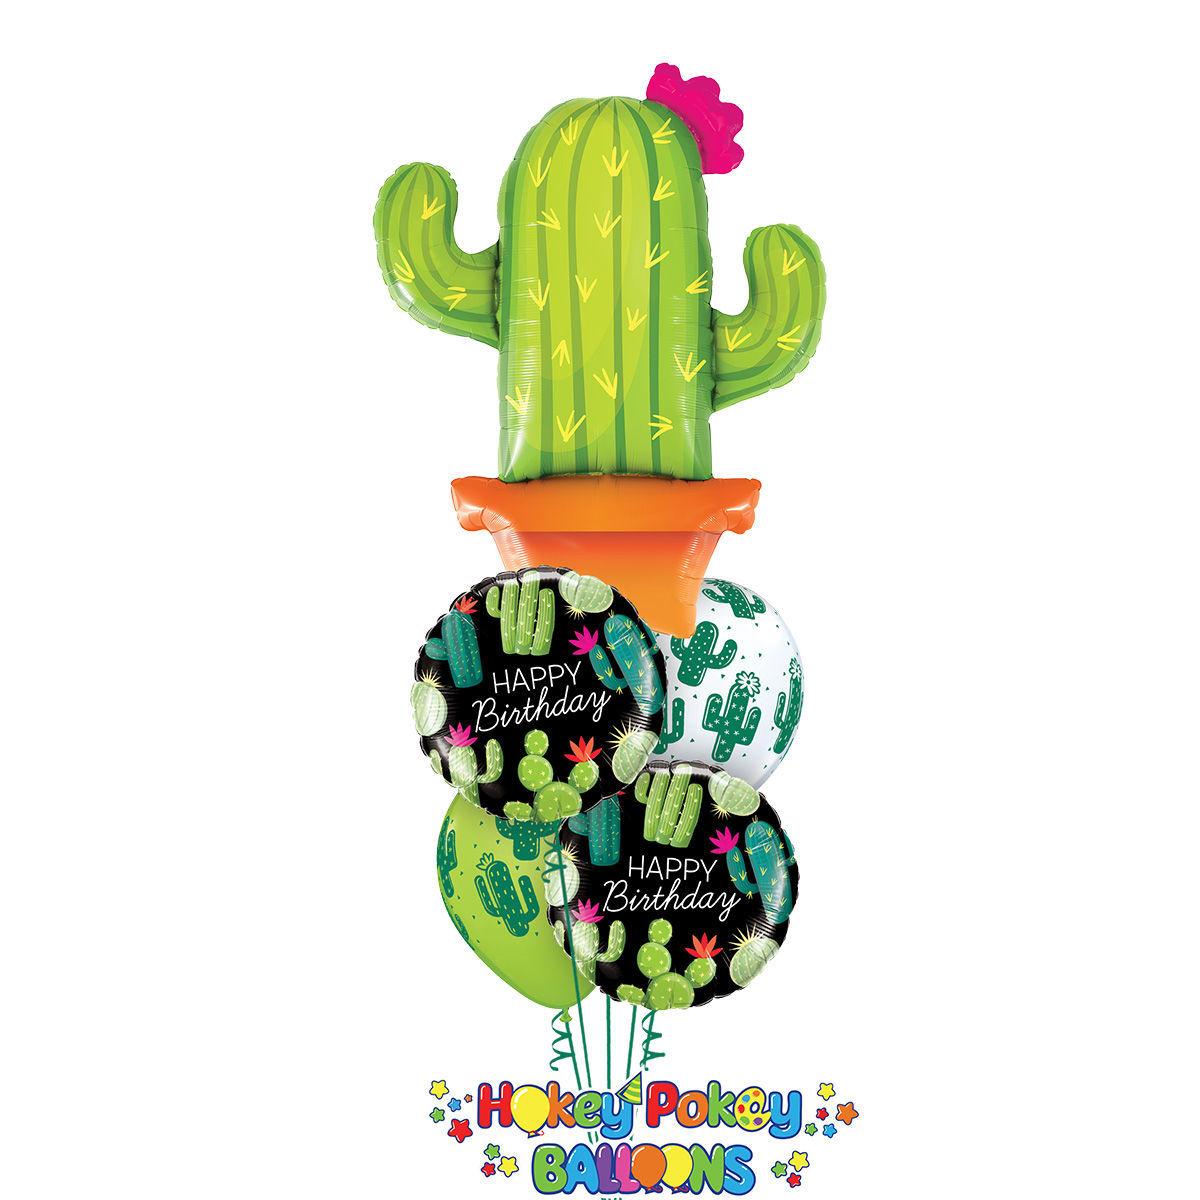 Picture of Birthday Fiesta Balloon Bouquet with Jumbo Cactus